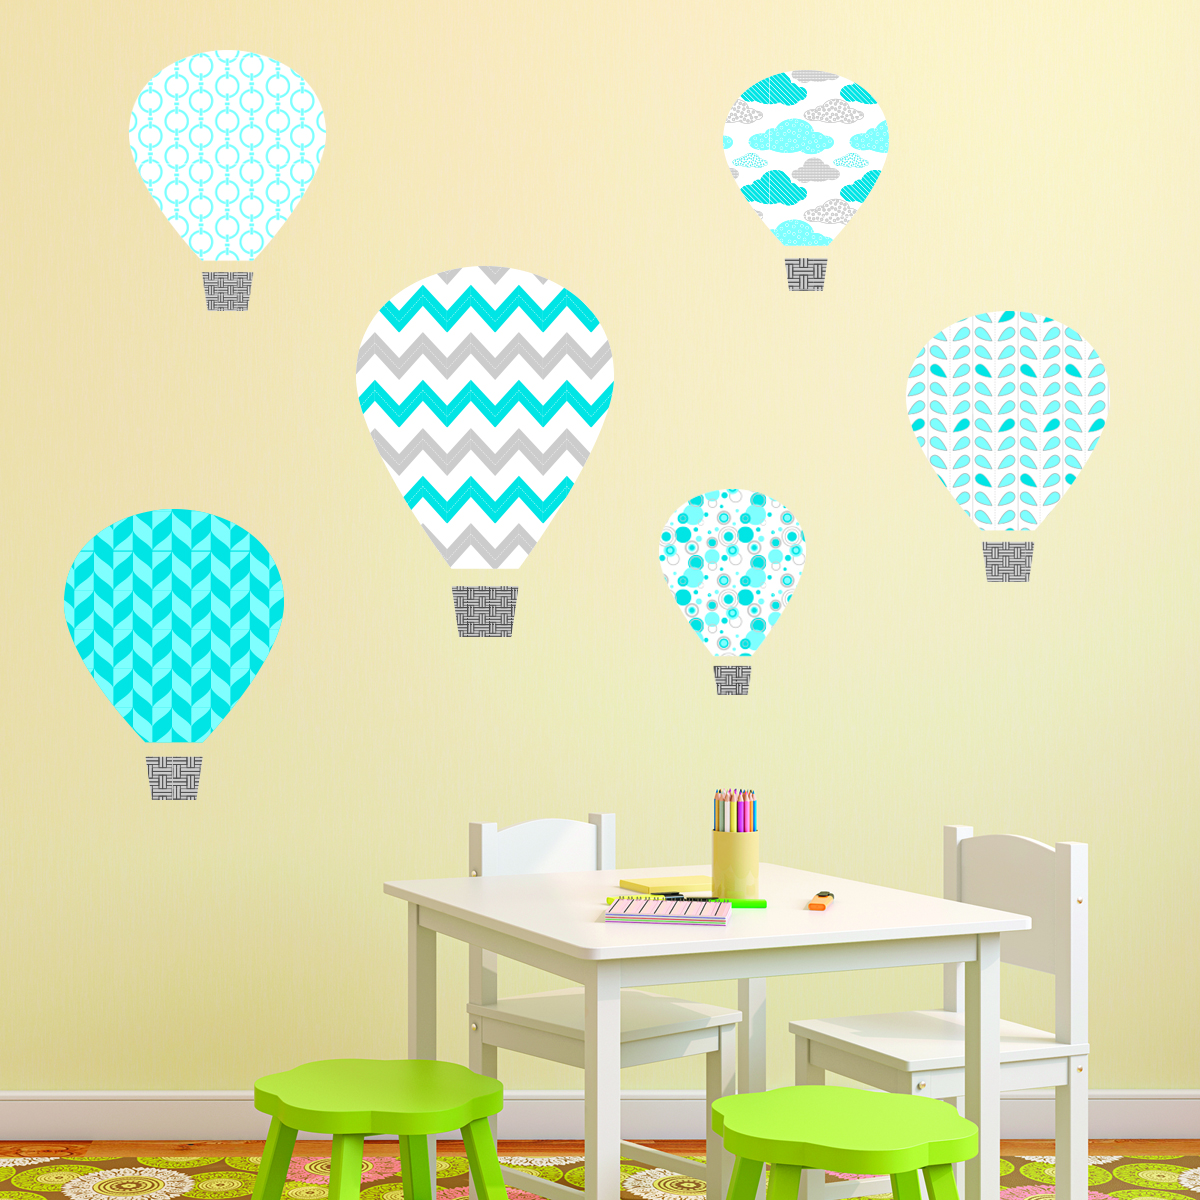 Hot Air Balloon Blue Textstyles Decals Prev Next «